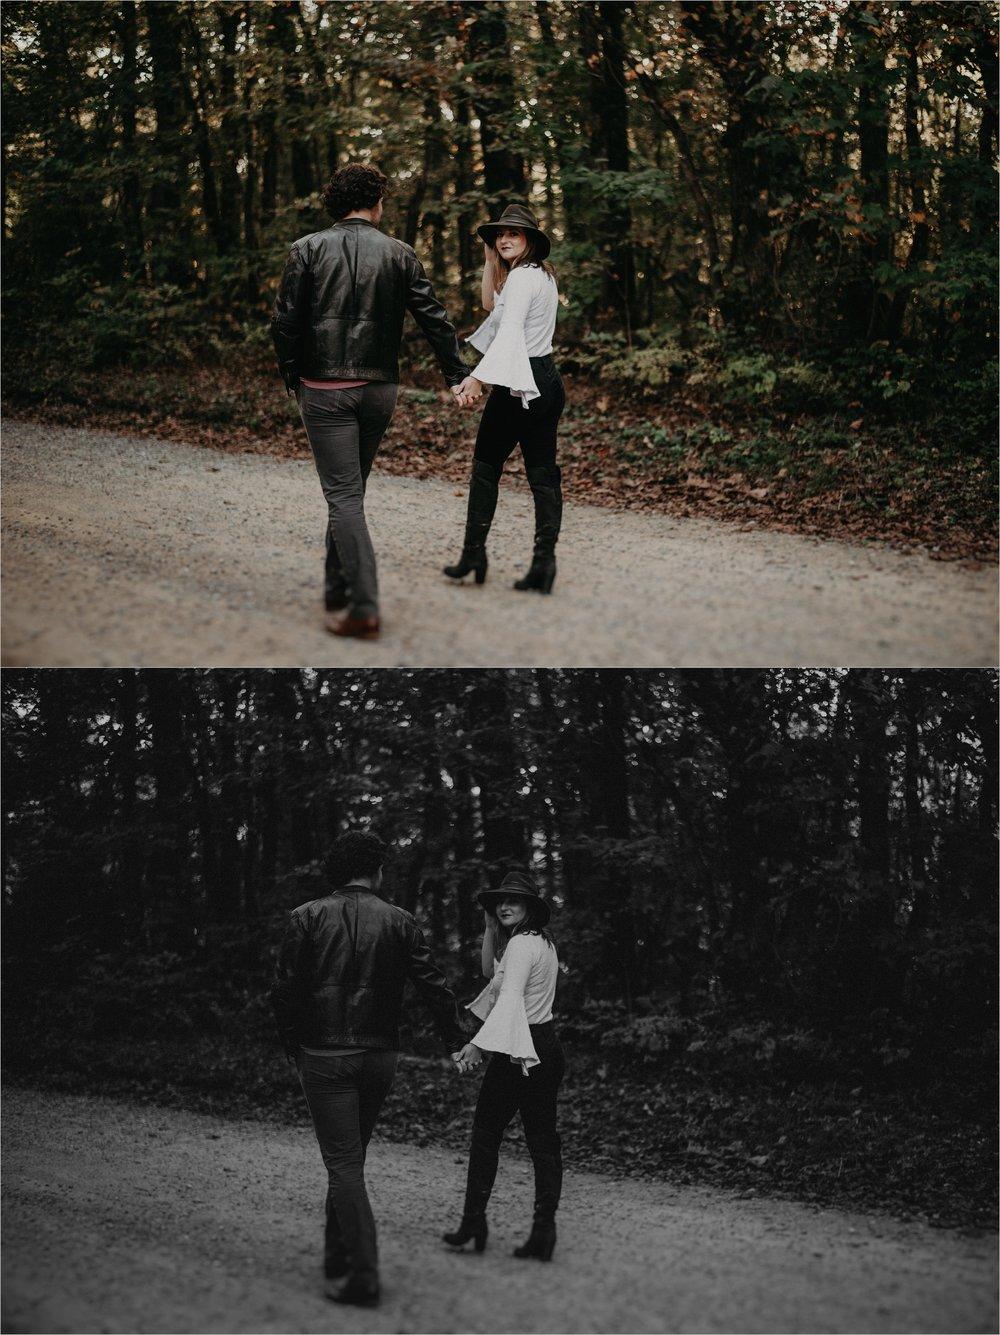 Taylor_English_Photography_Snoopers_Rock_Signal_Mtn_Tn_0001.jpg